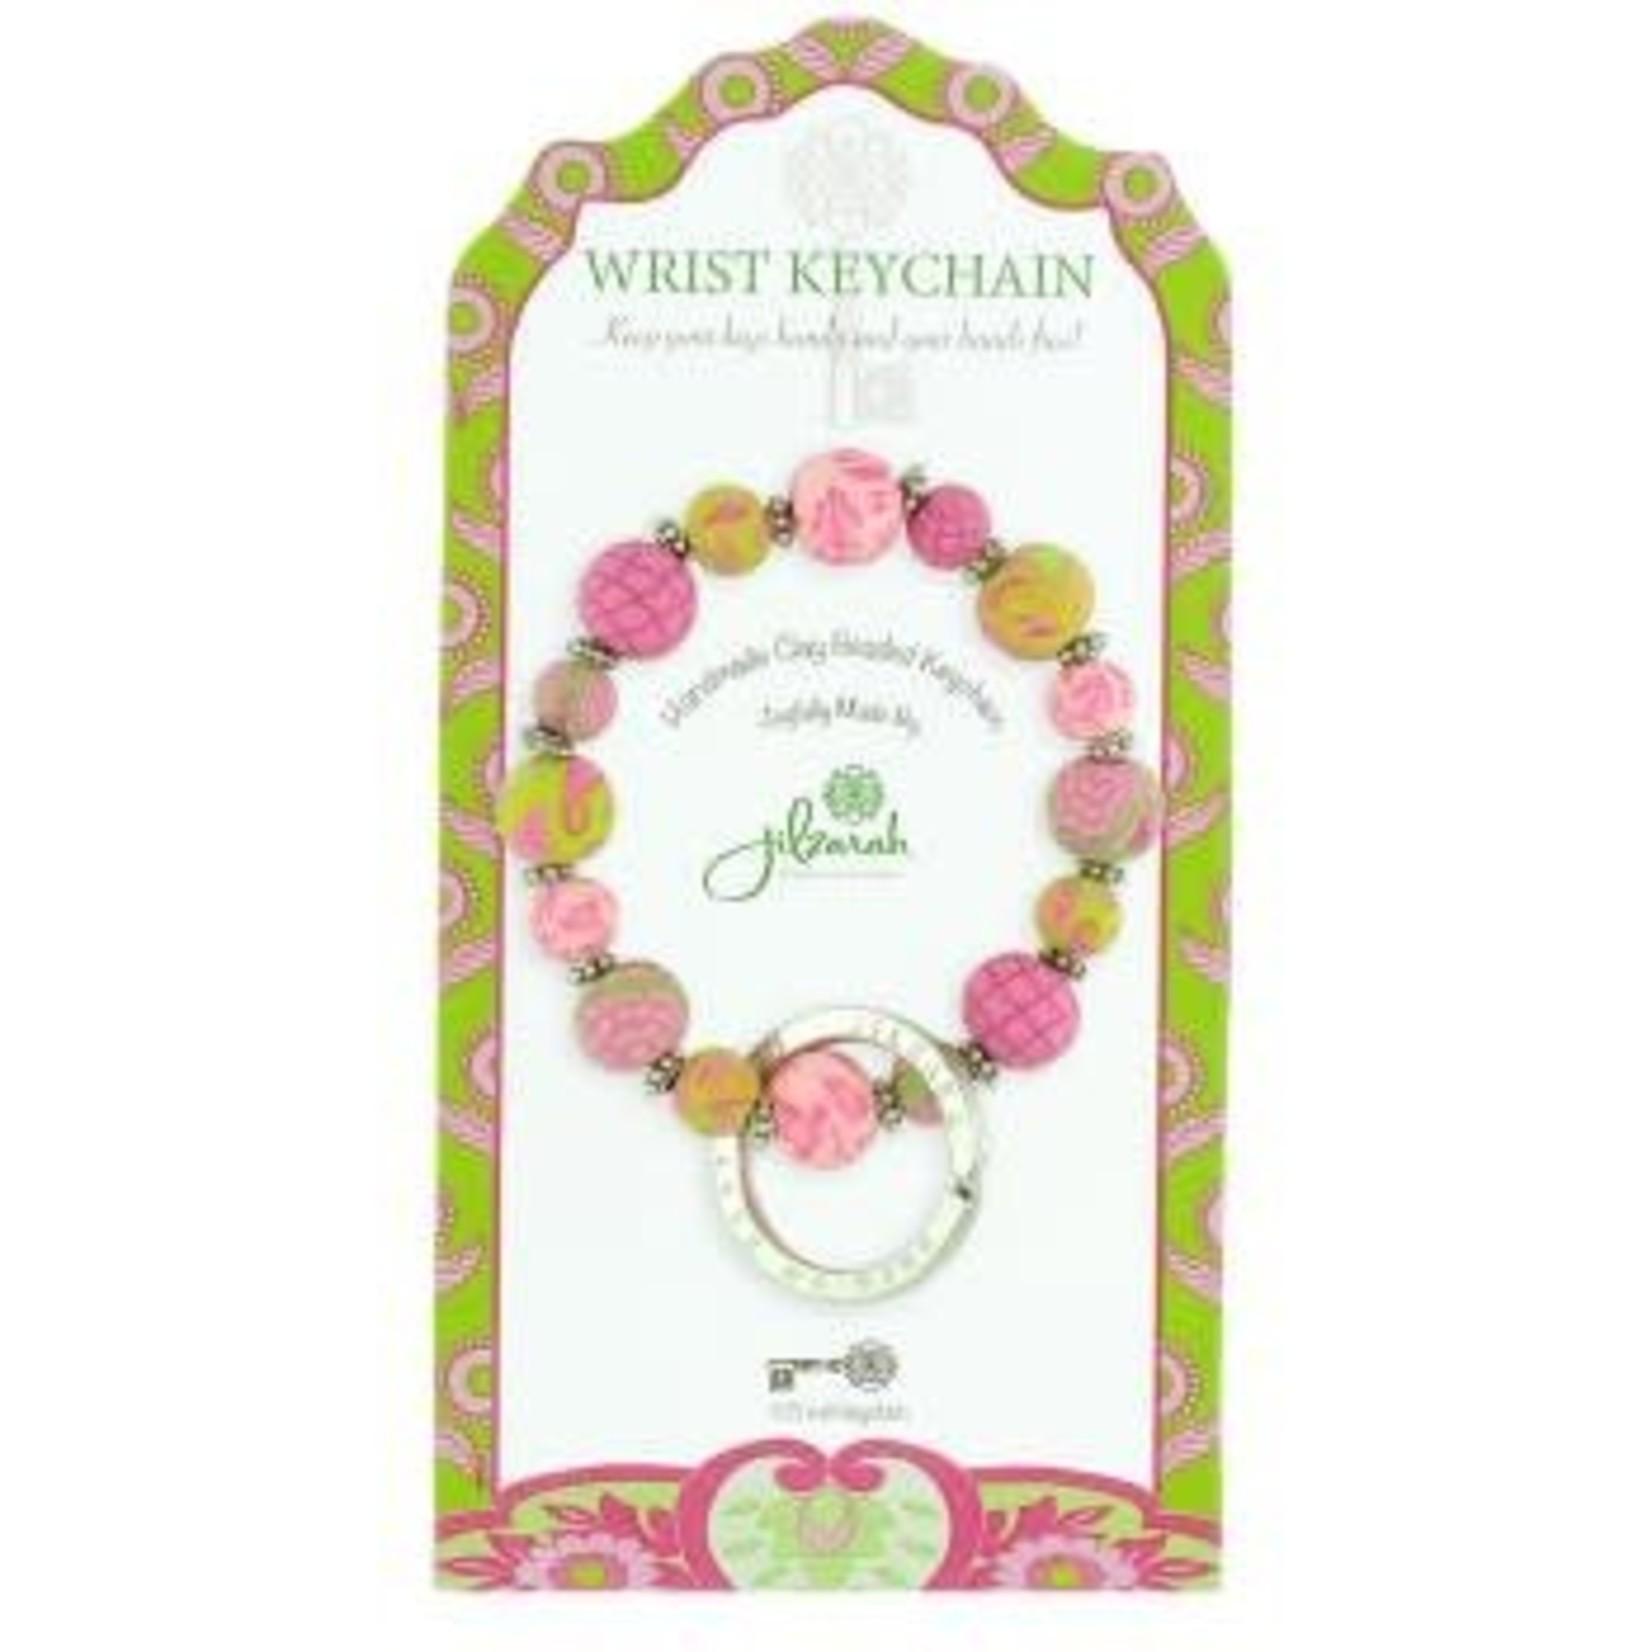 Jilzarah 805-029 Paisley Pink Mini Wrist Keychain